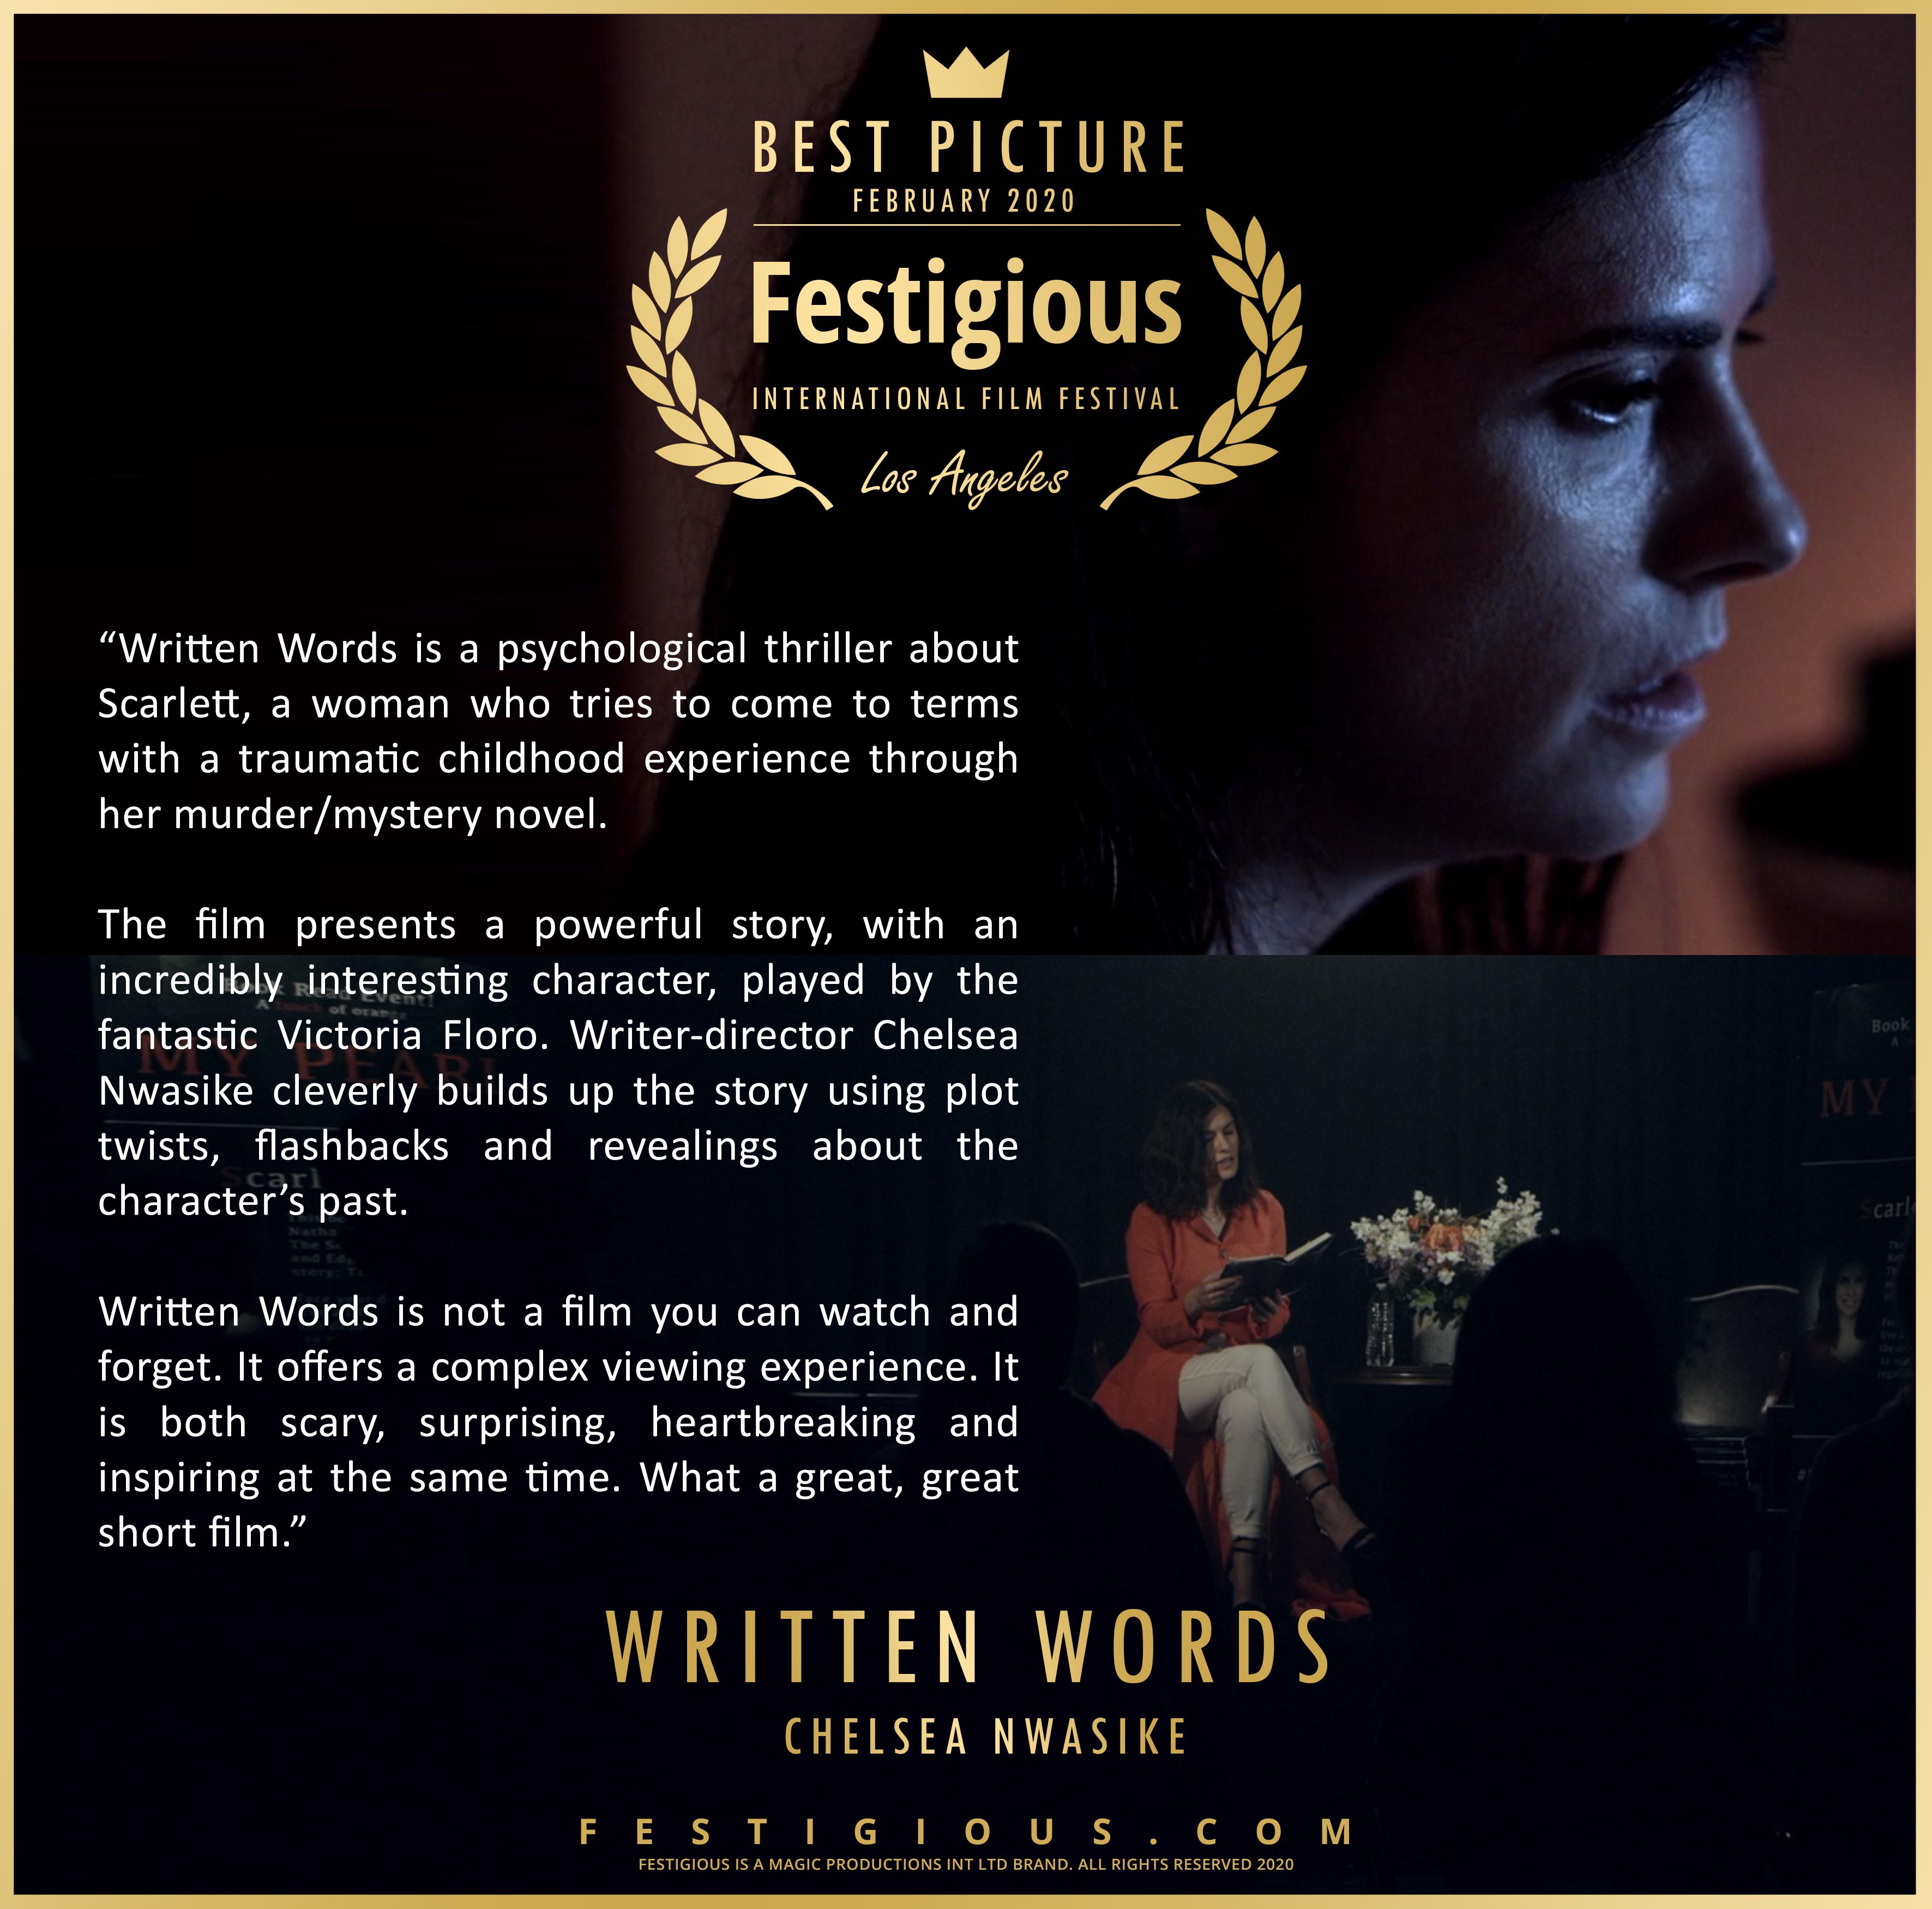 Written Words review